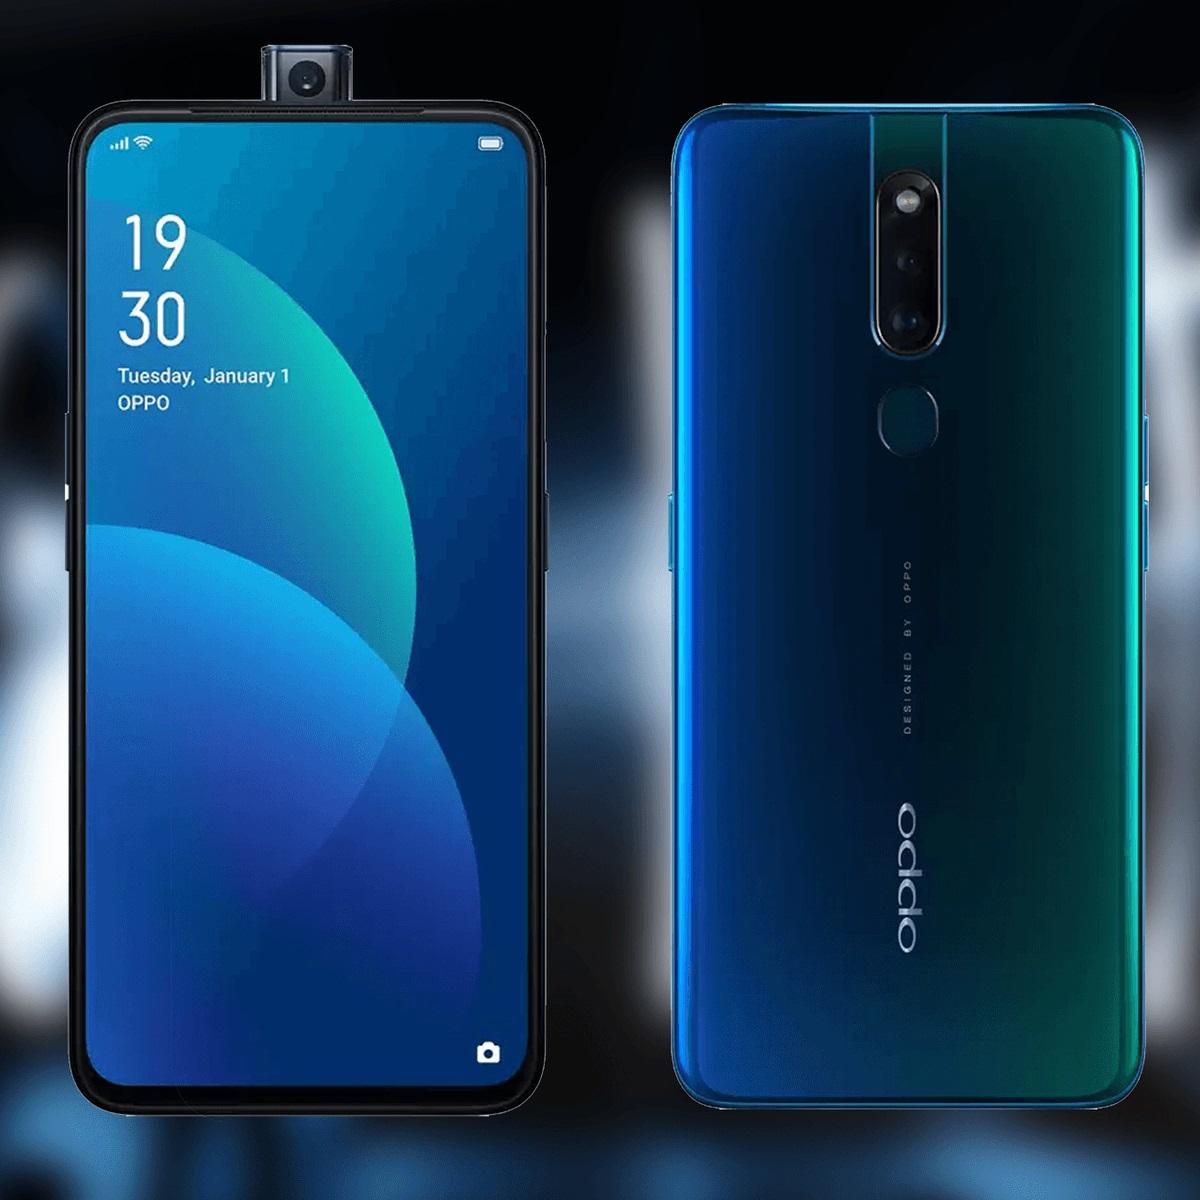 هل هاتف Oppo A9 2020 بديلًا لهاتف Oppo F11 Pro